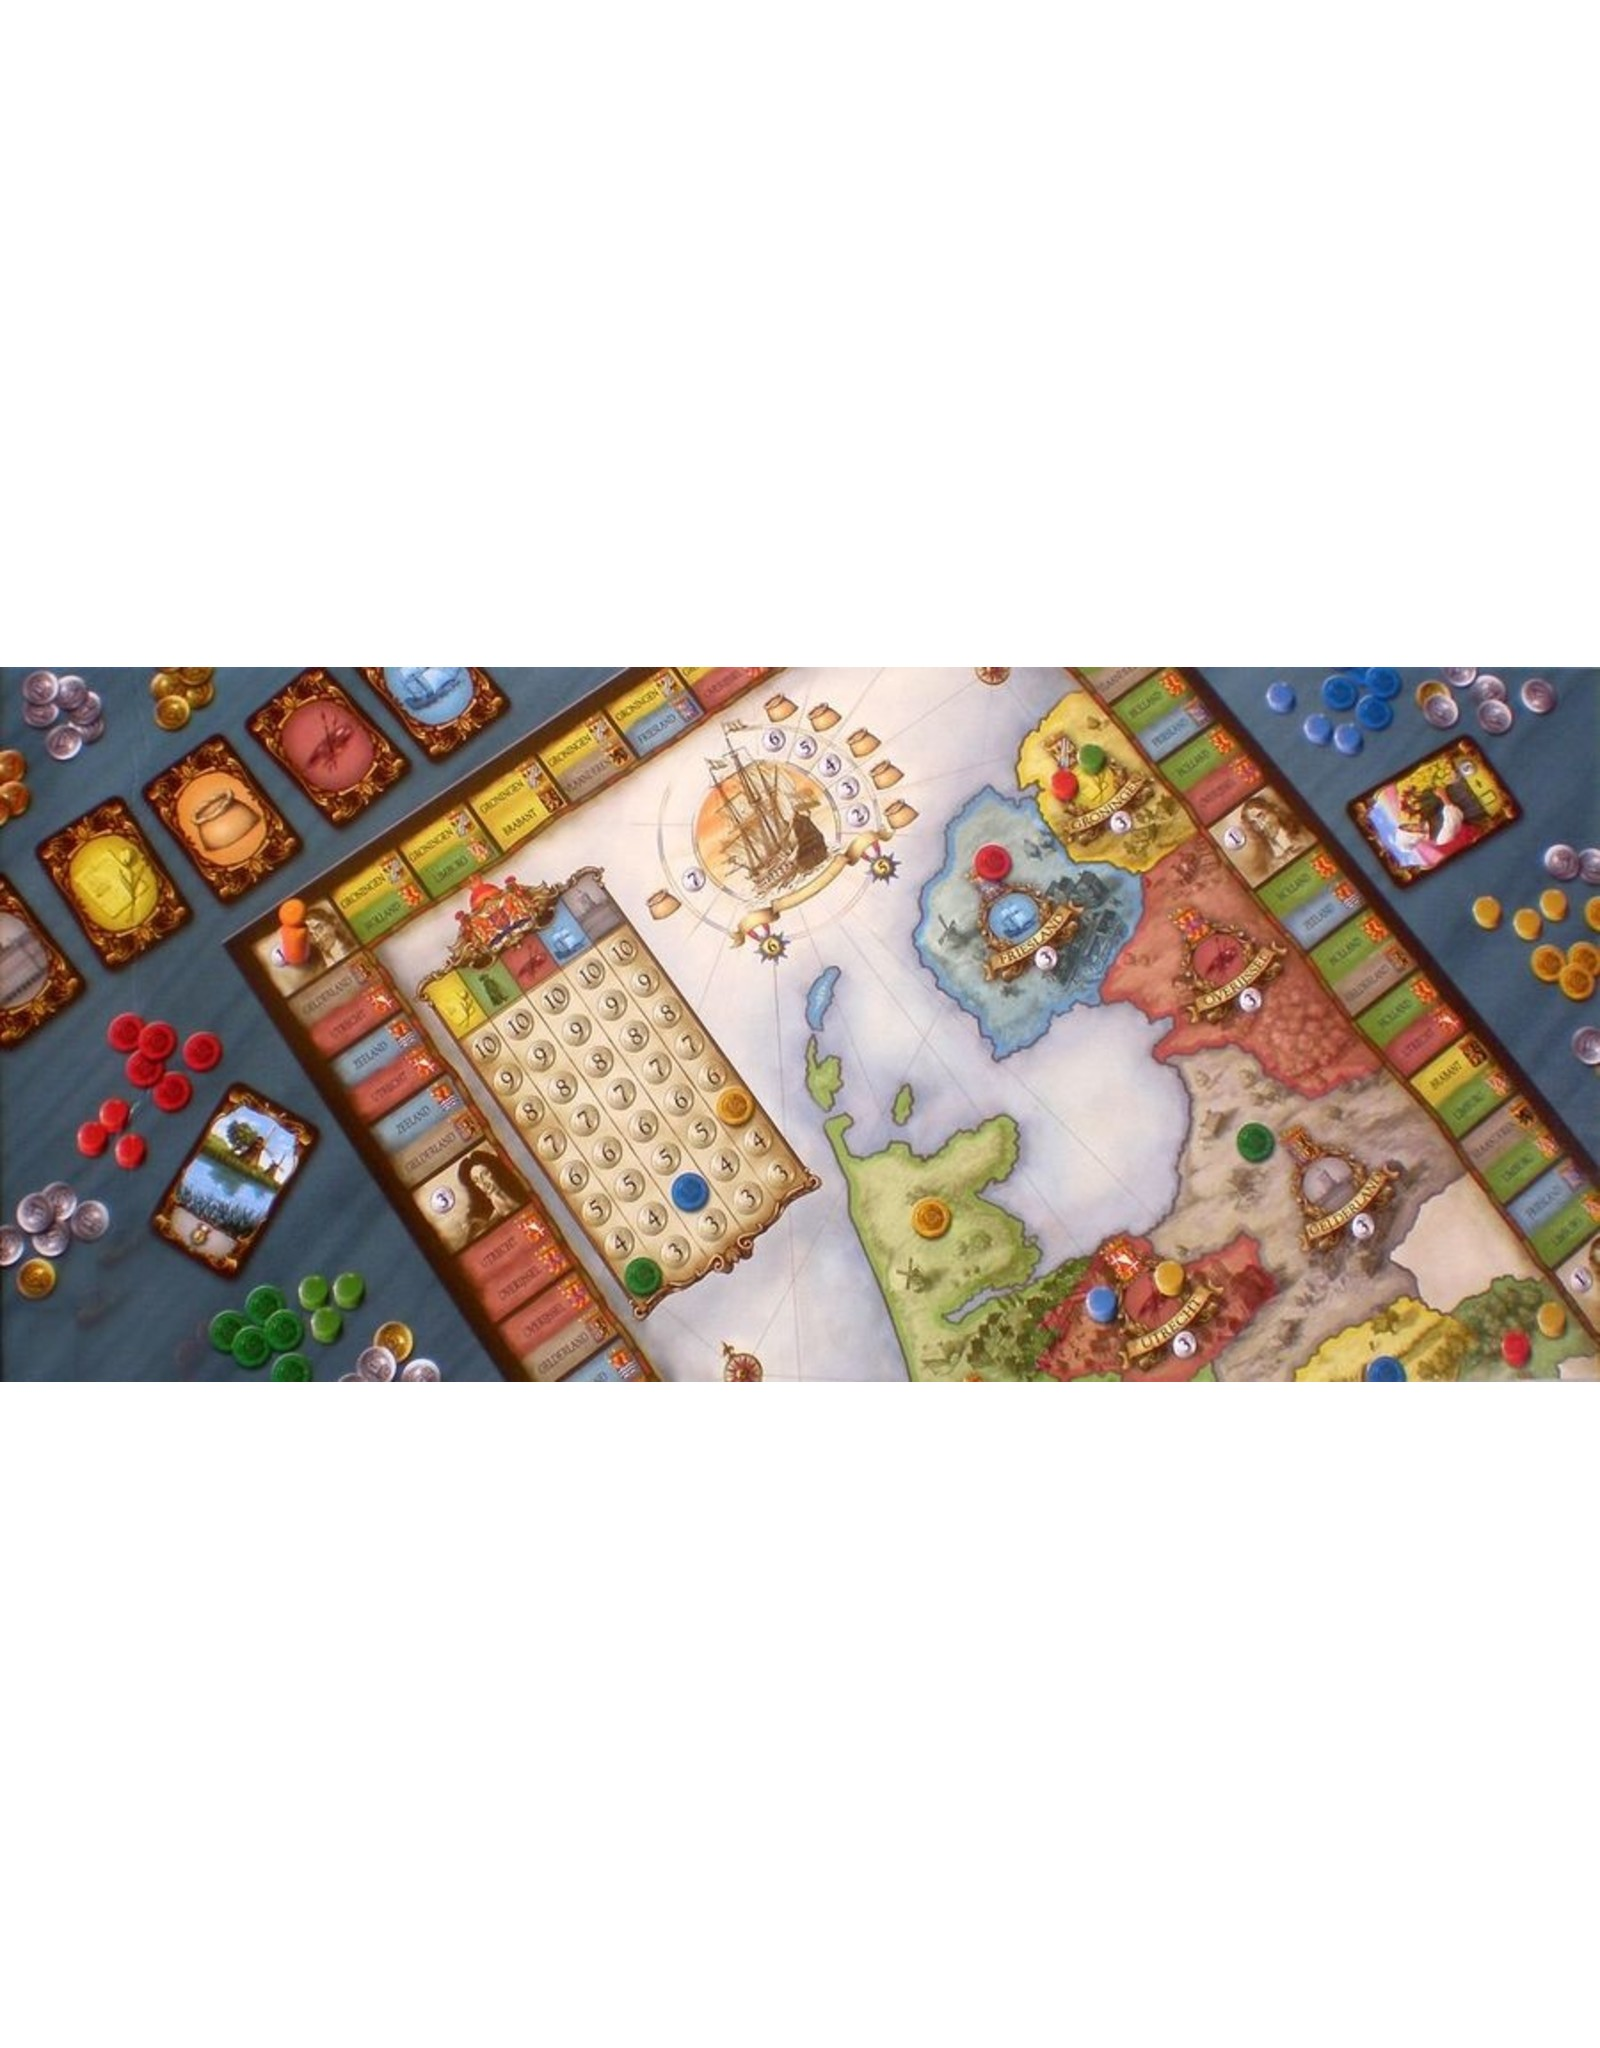 Mayfair Games SALE - The Dutch Golden Age